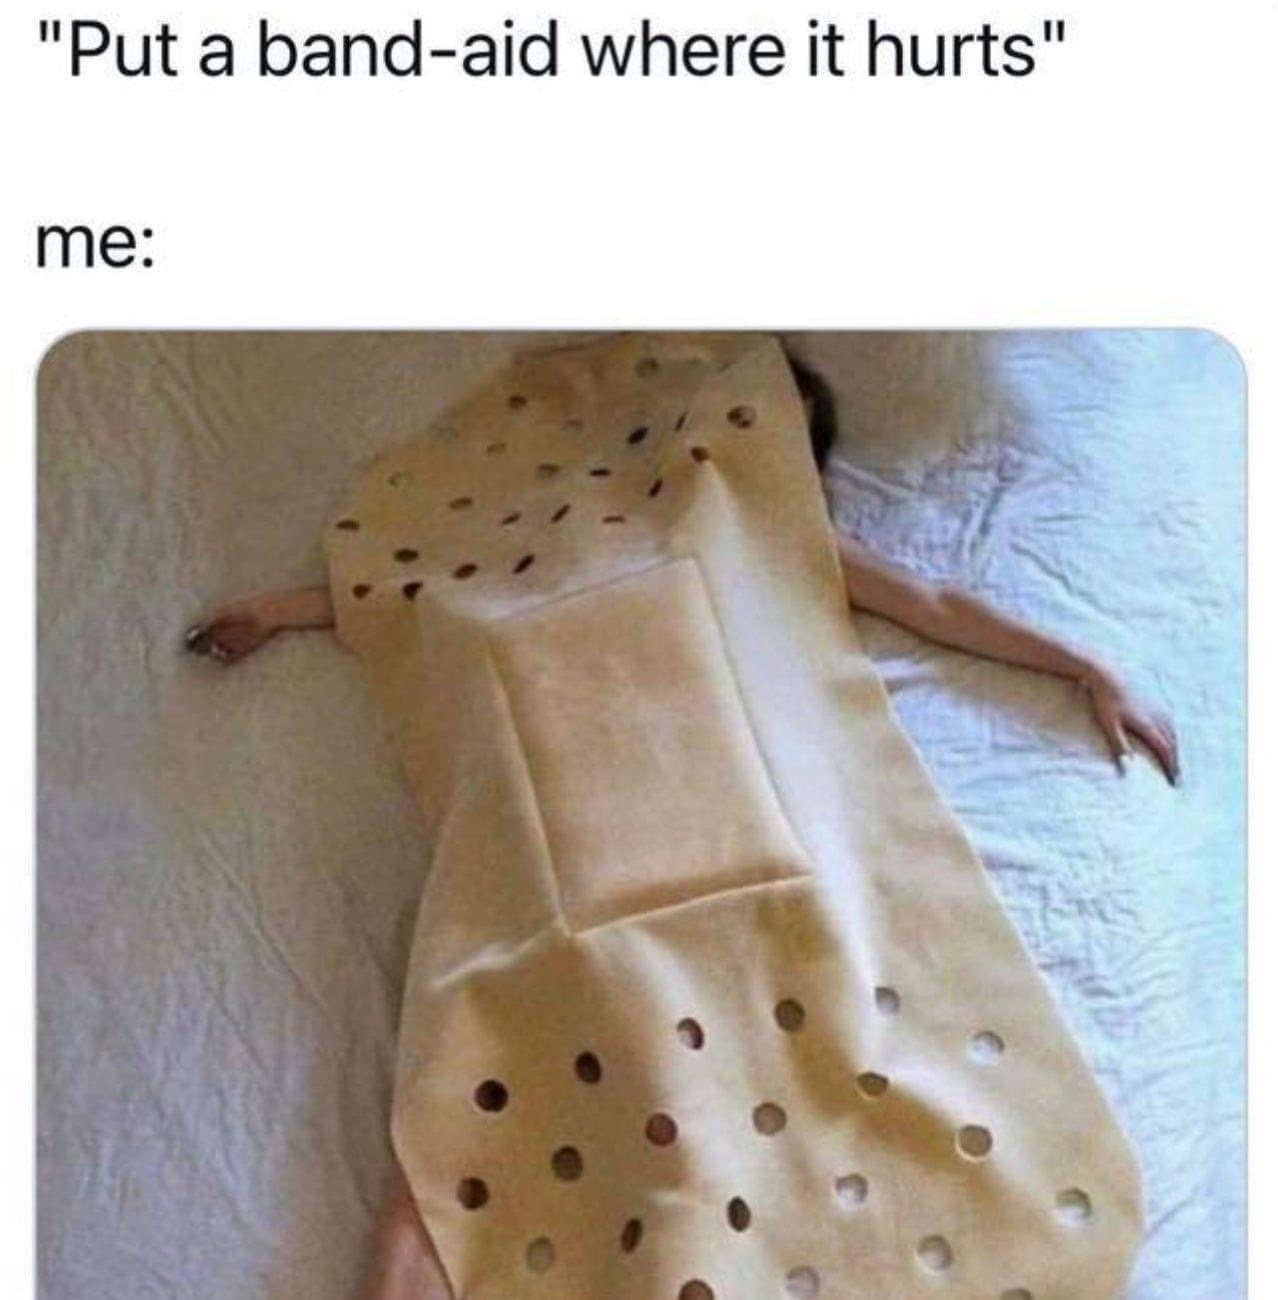 Put a band-aid where it hurts meme